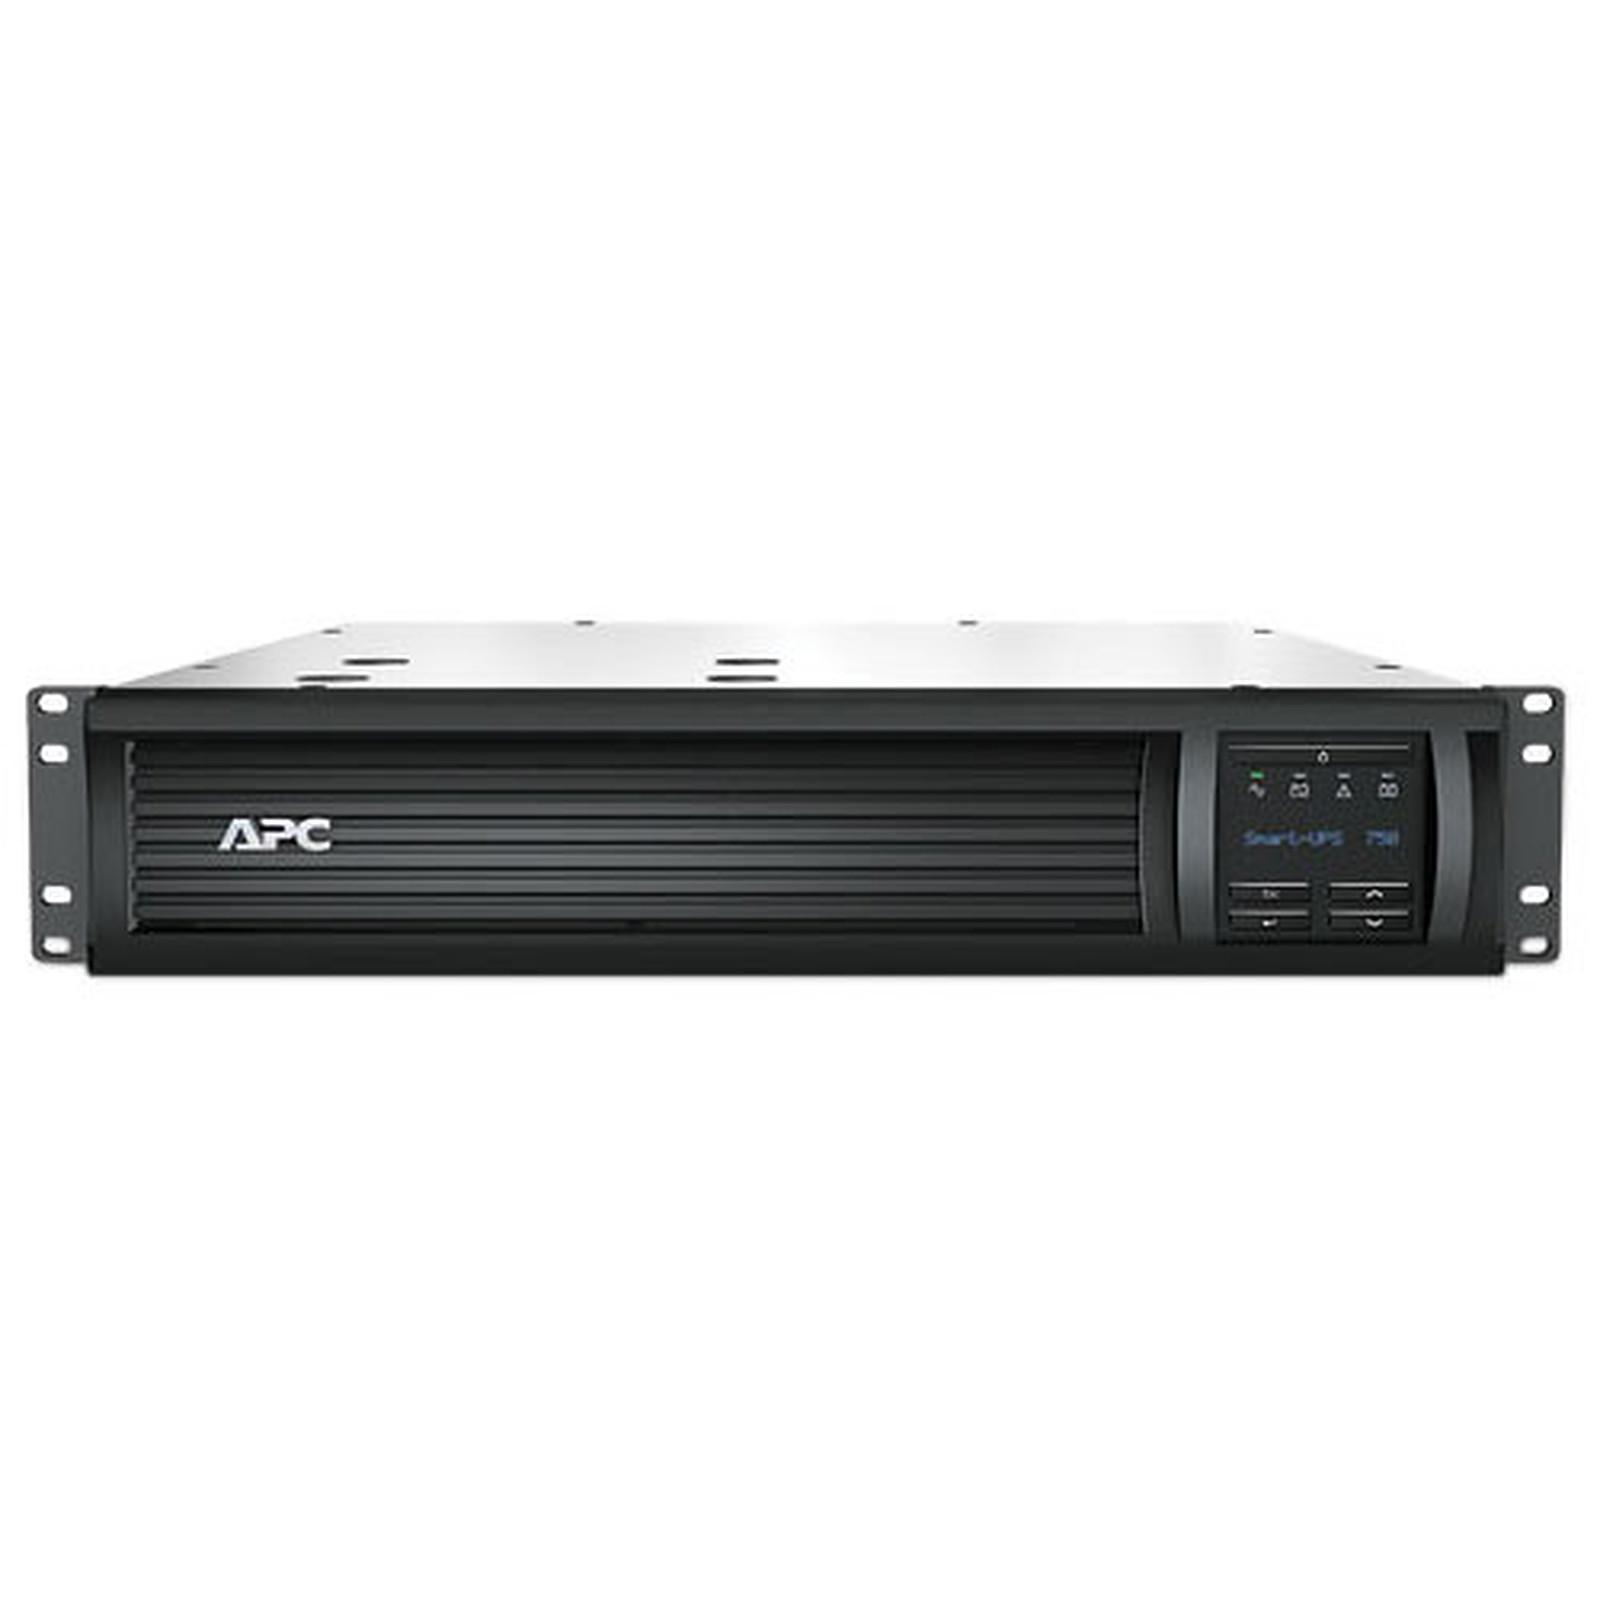 APC Smart-UPS Rack-Mount 750VA LCD 230V